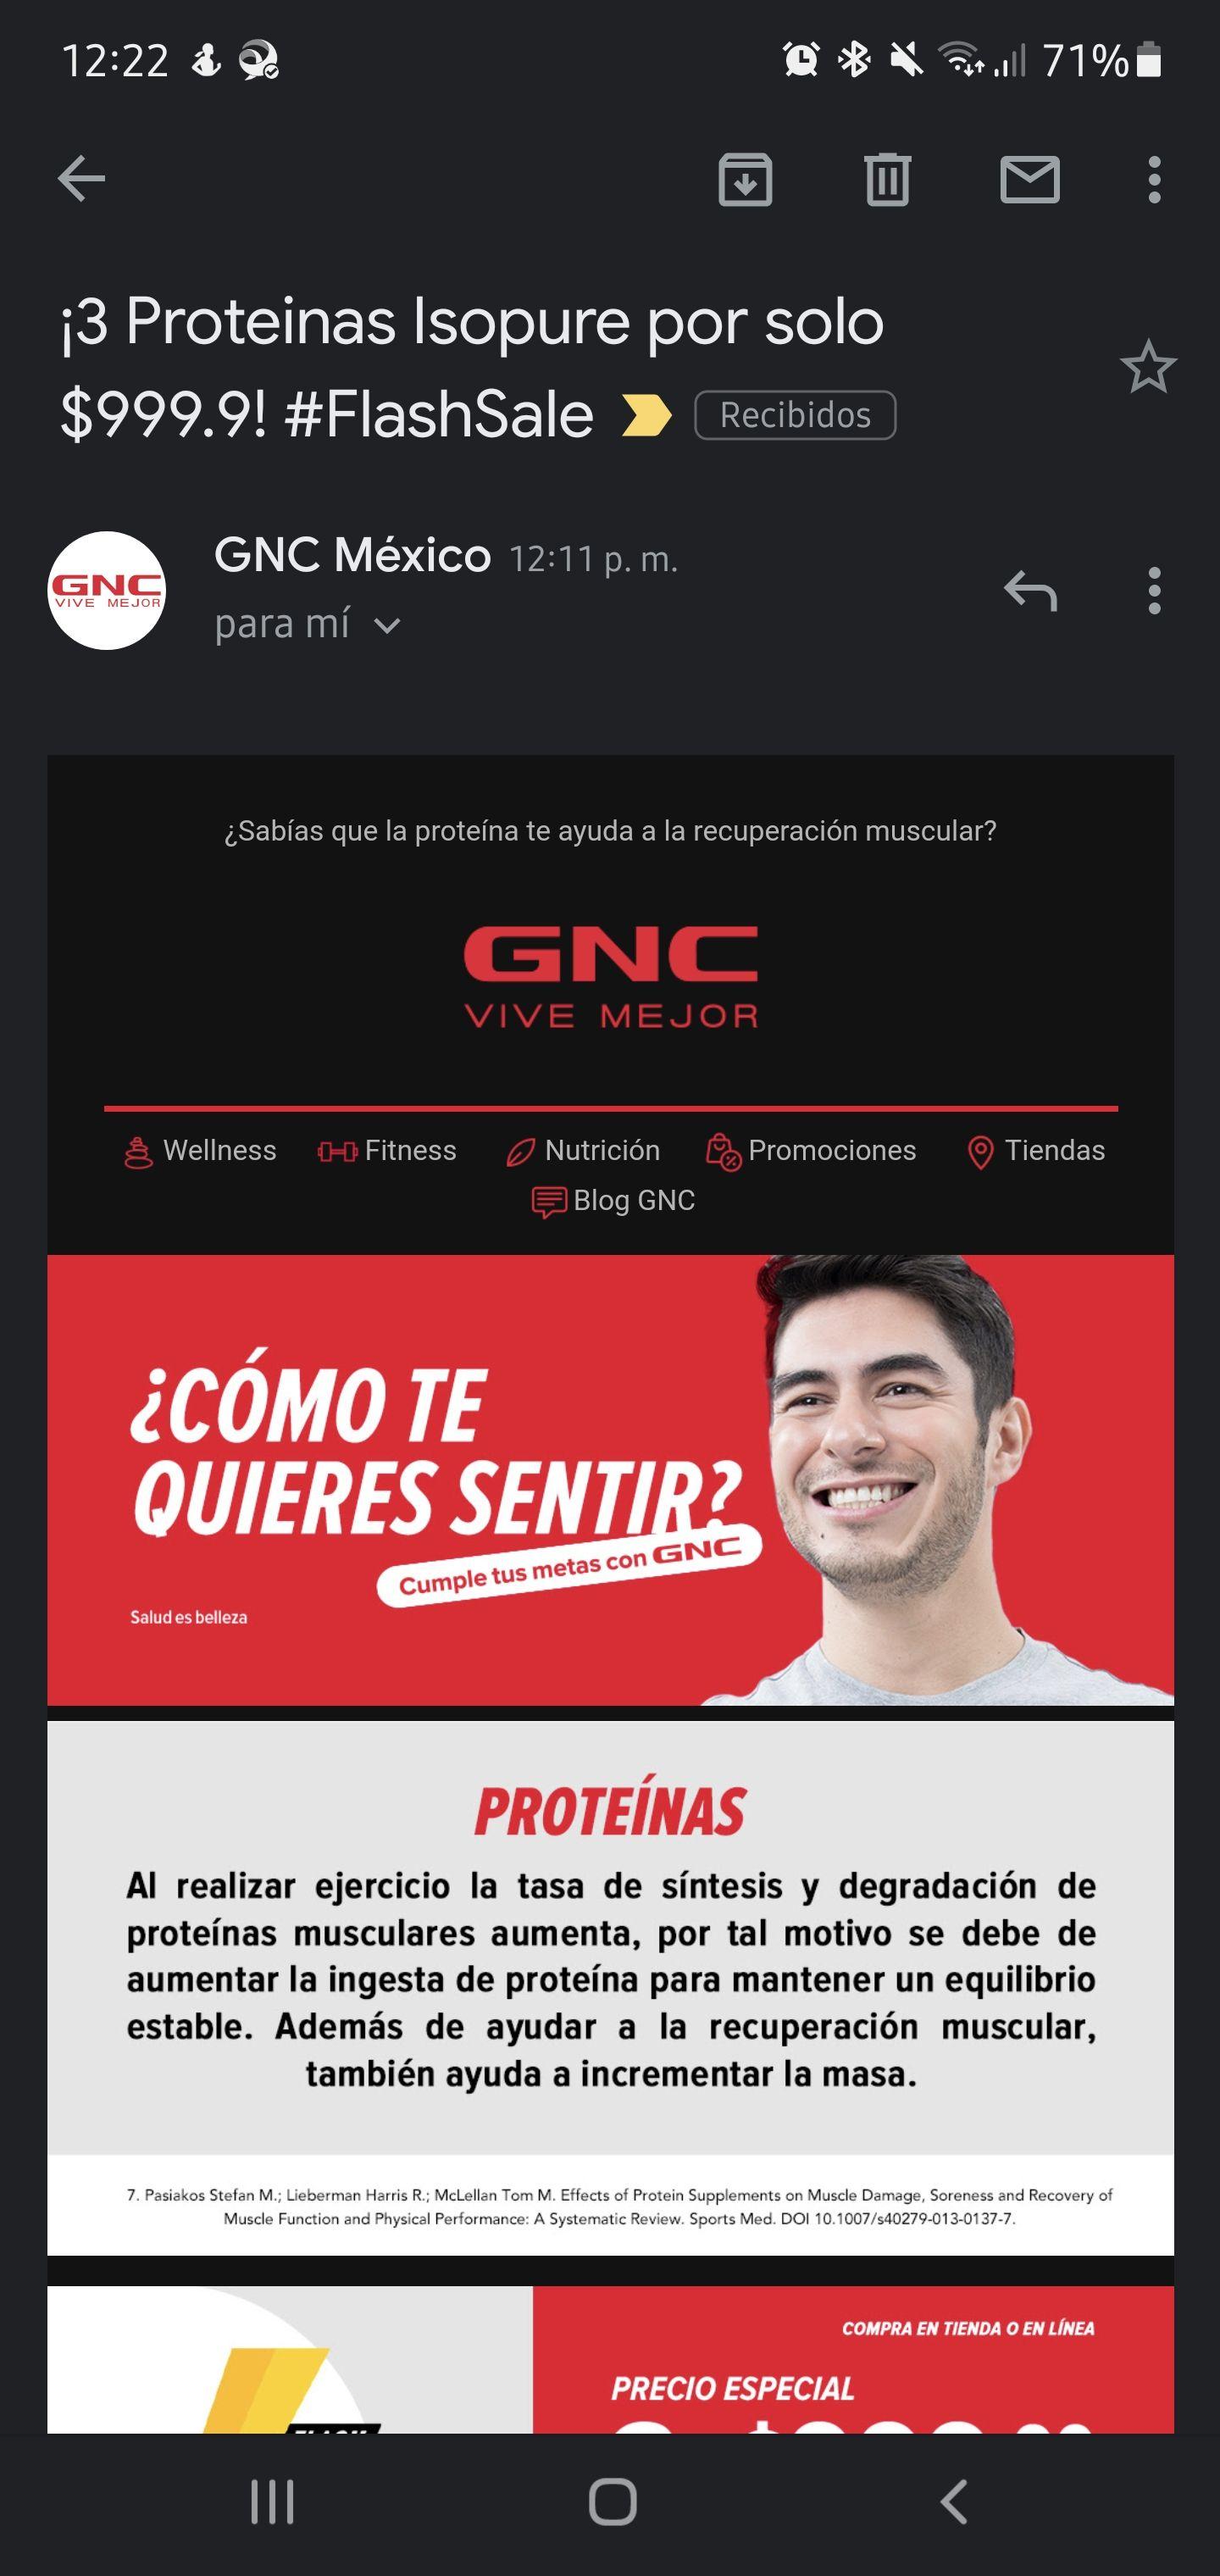 GNC 3 bolsas de Isopure por 999